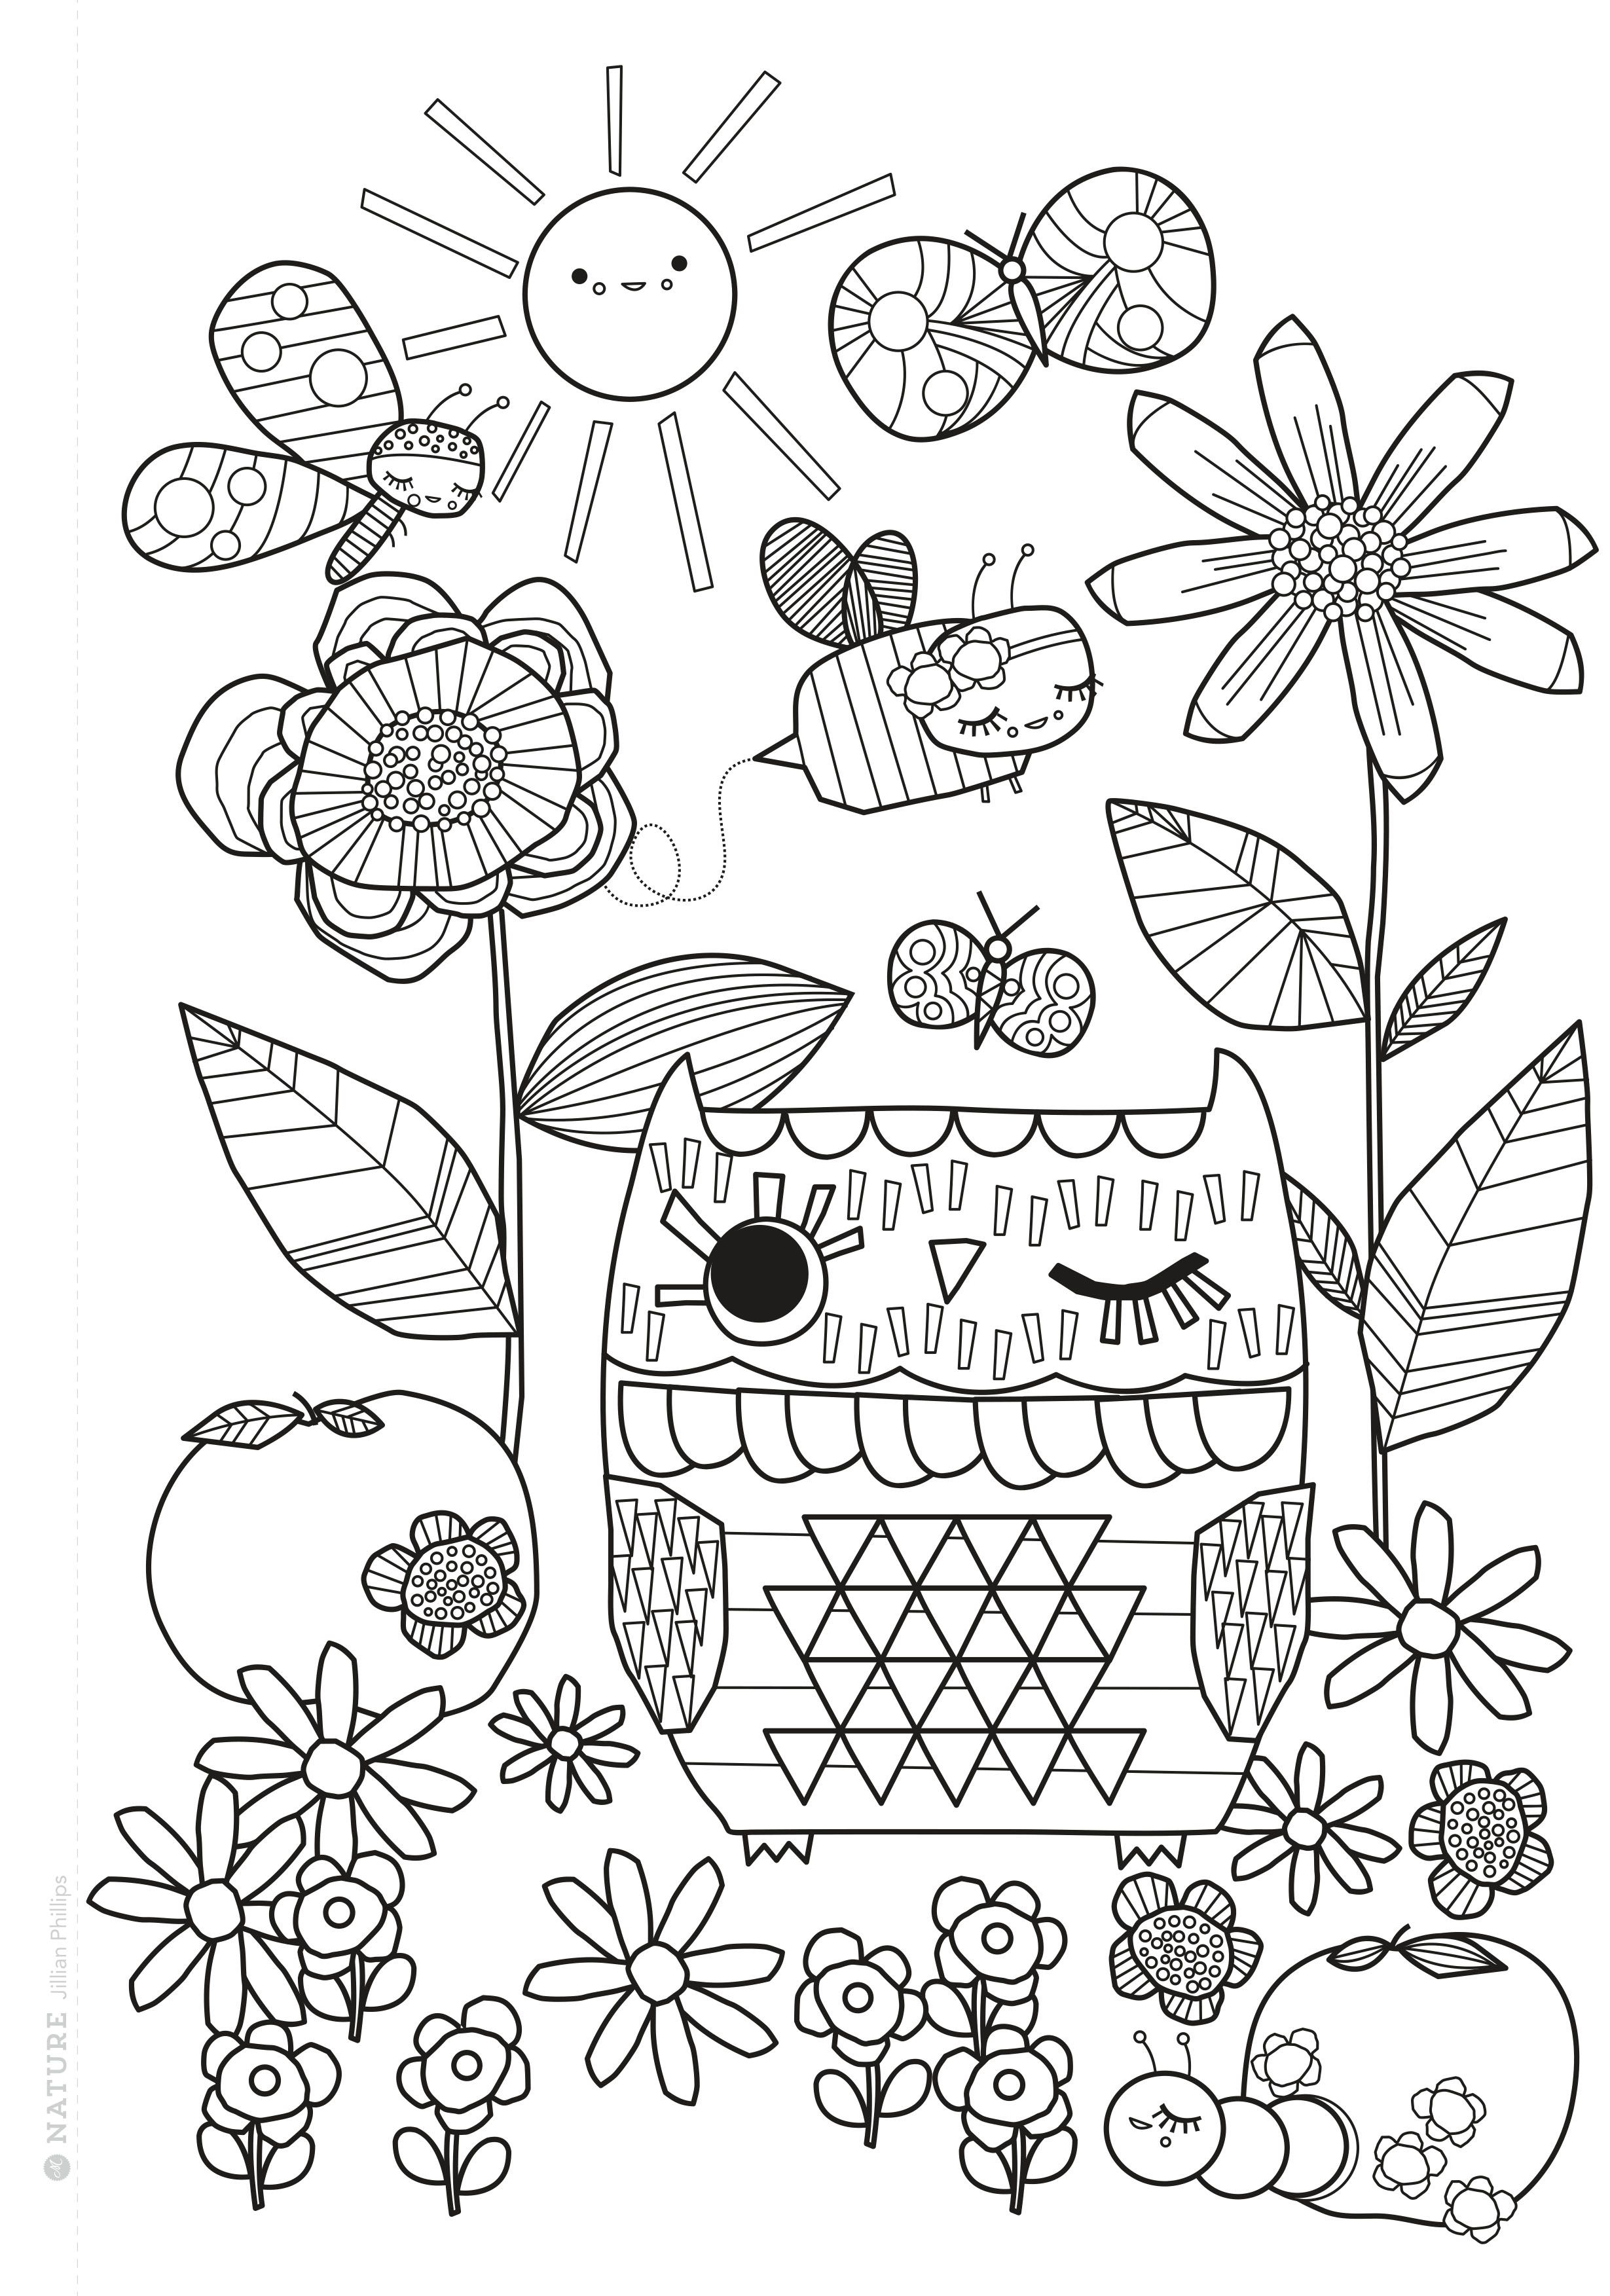 Mollie Makes Colouring Book